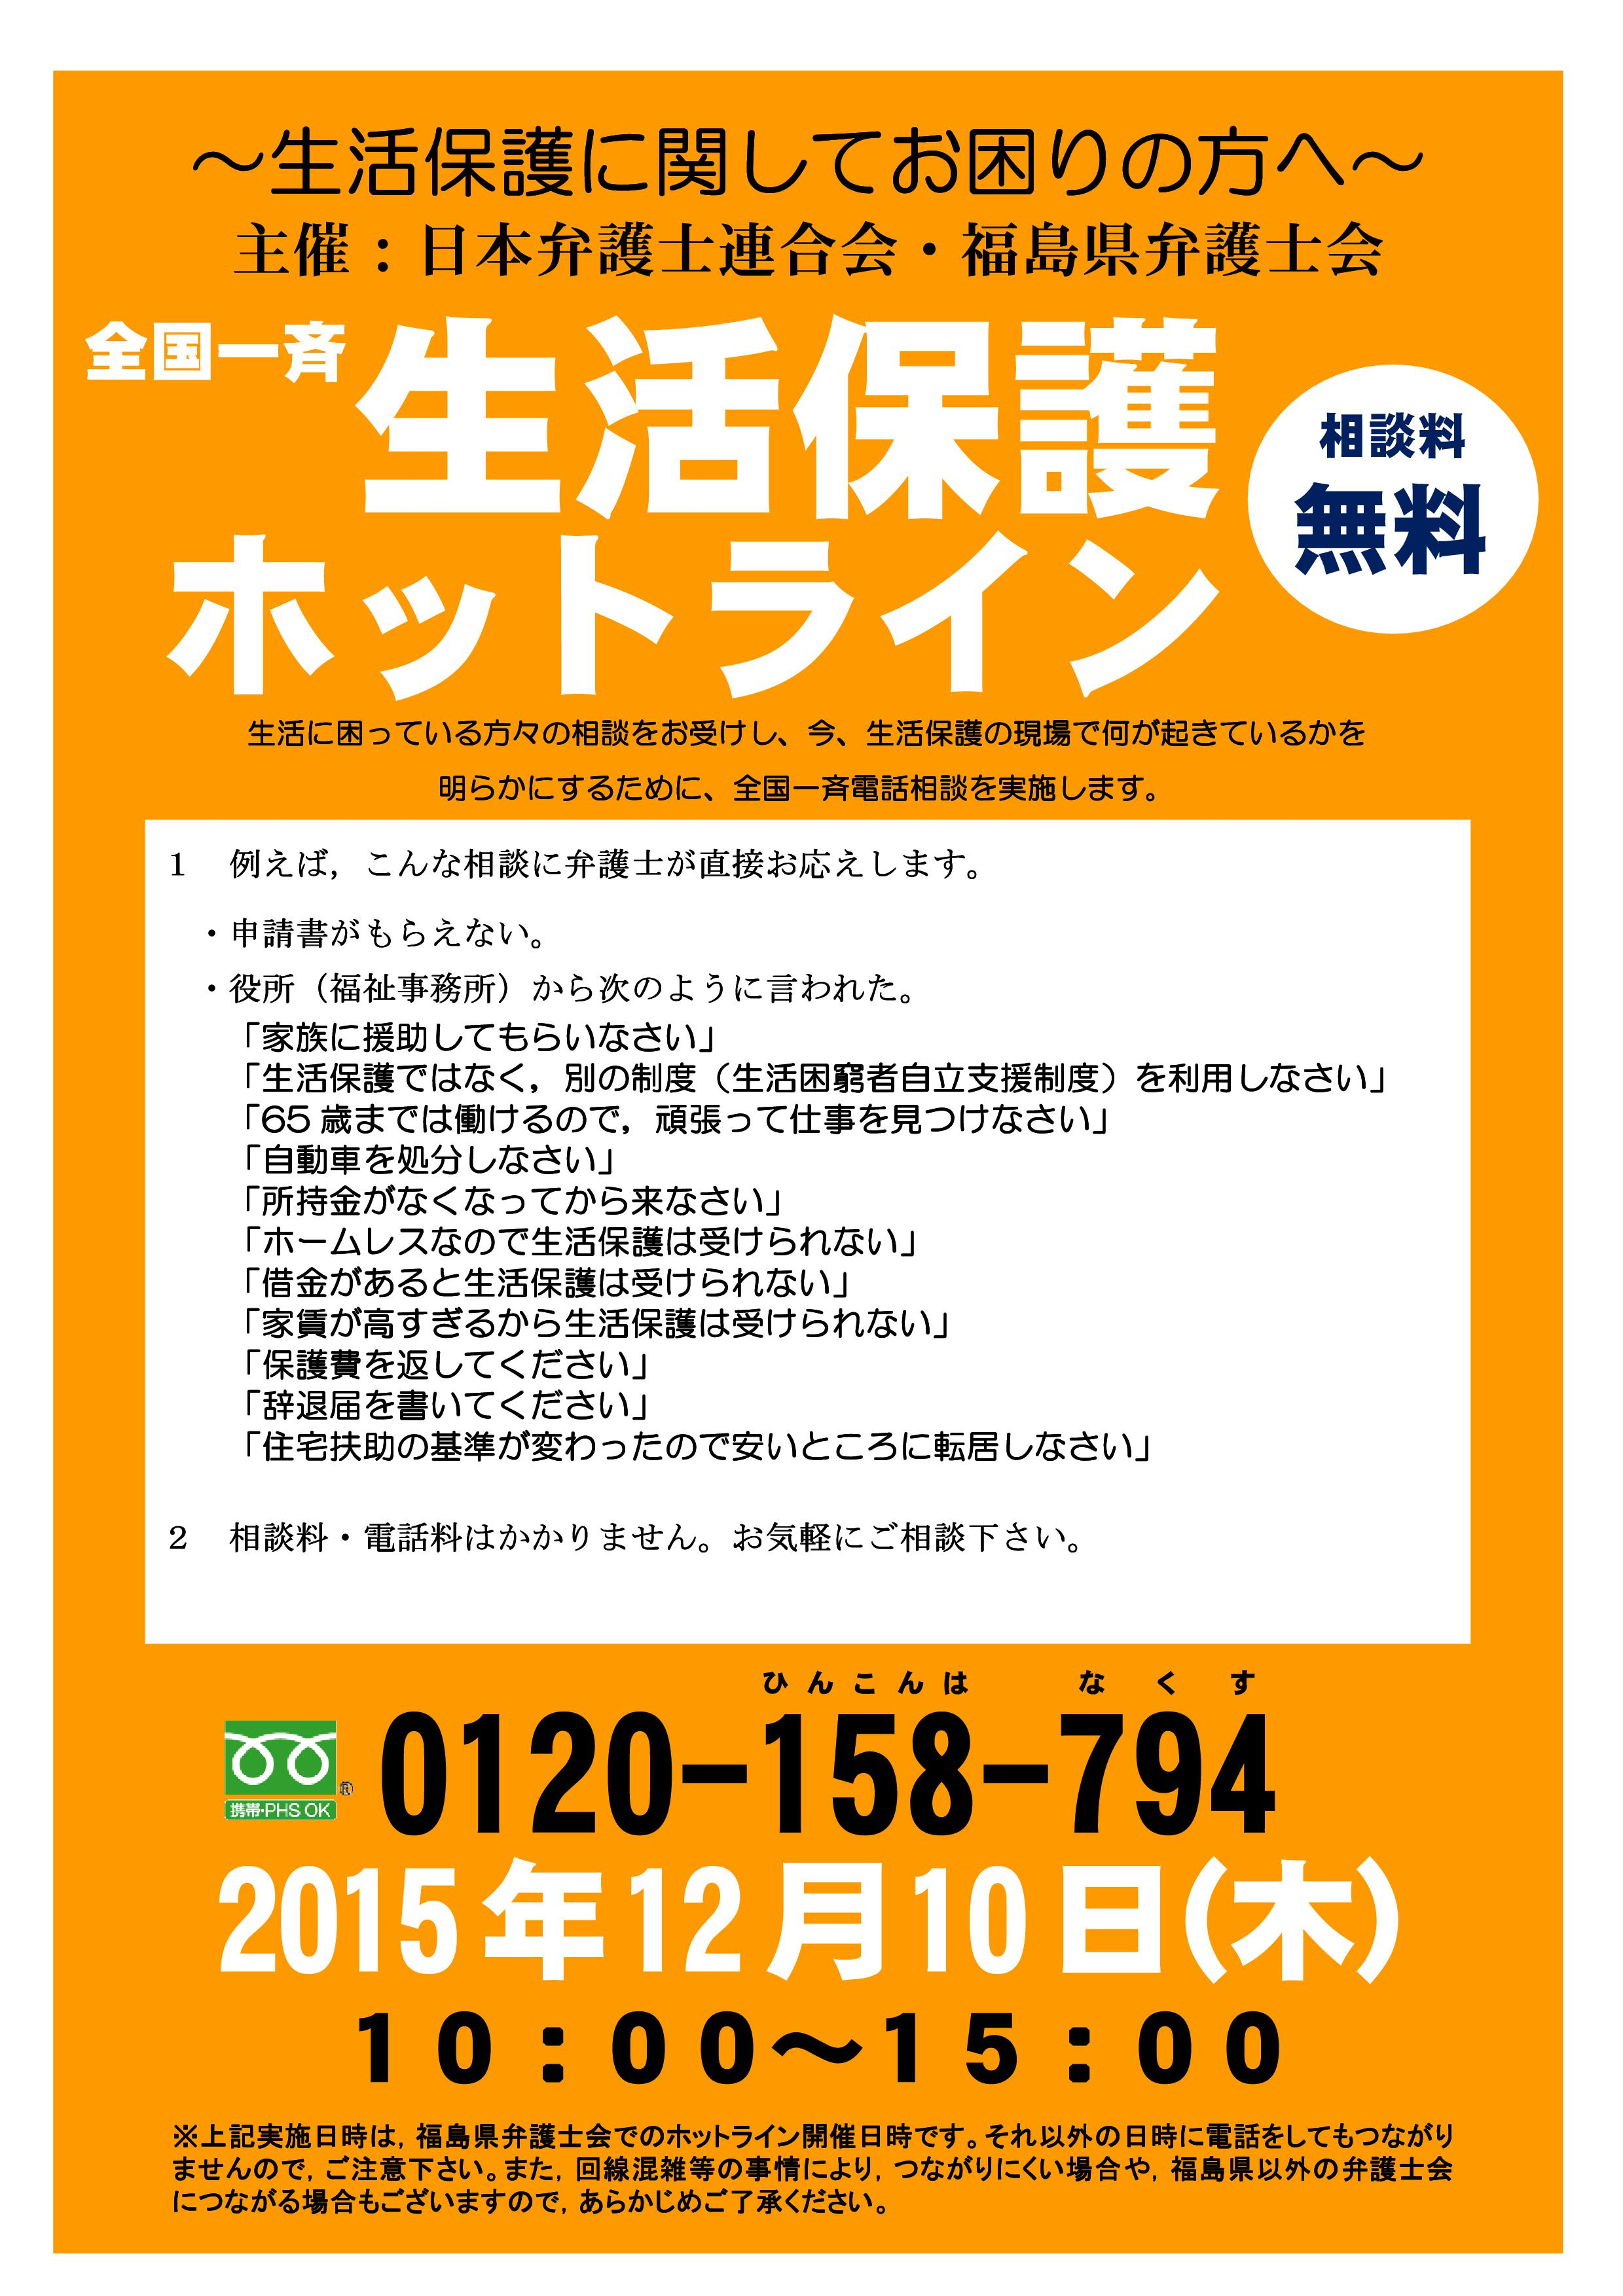 Microsoft Word - 20151210生活保護ホットラインチラシ(福島県版)